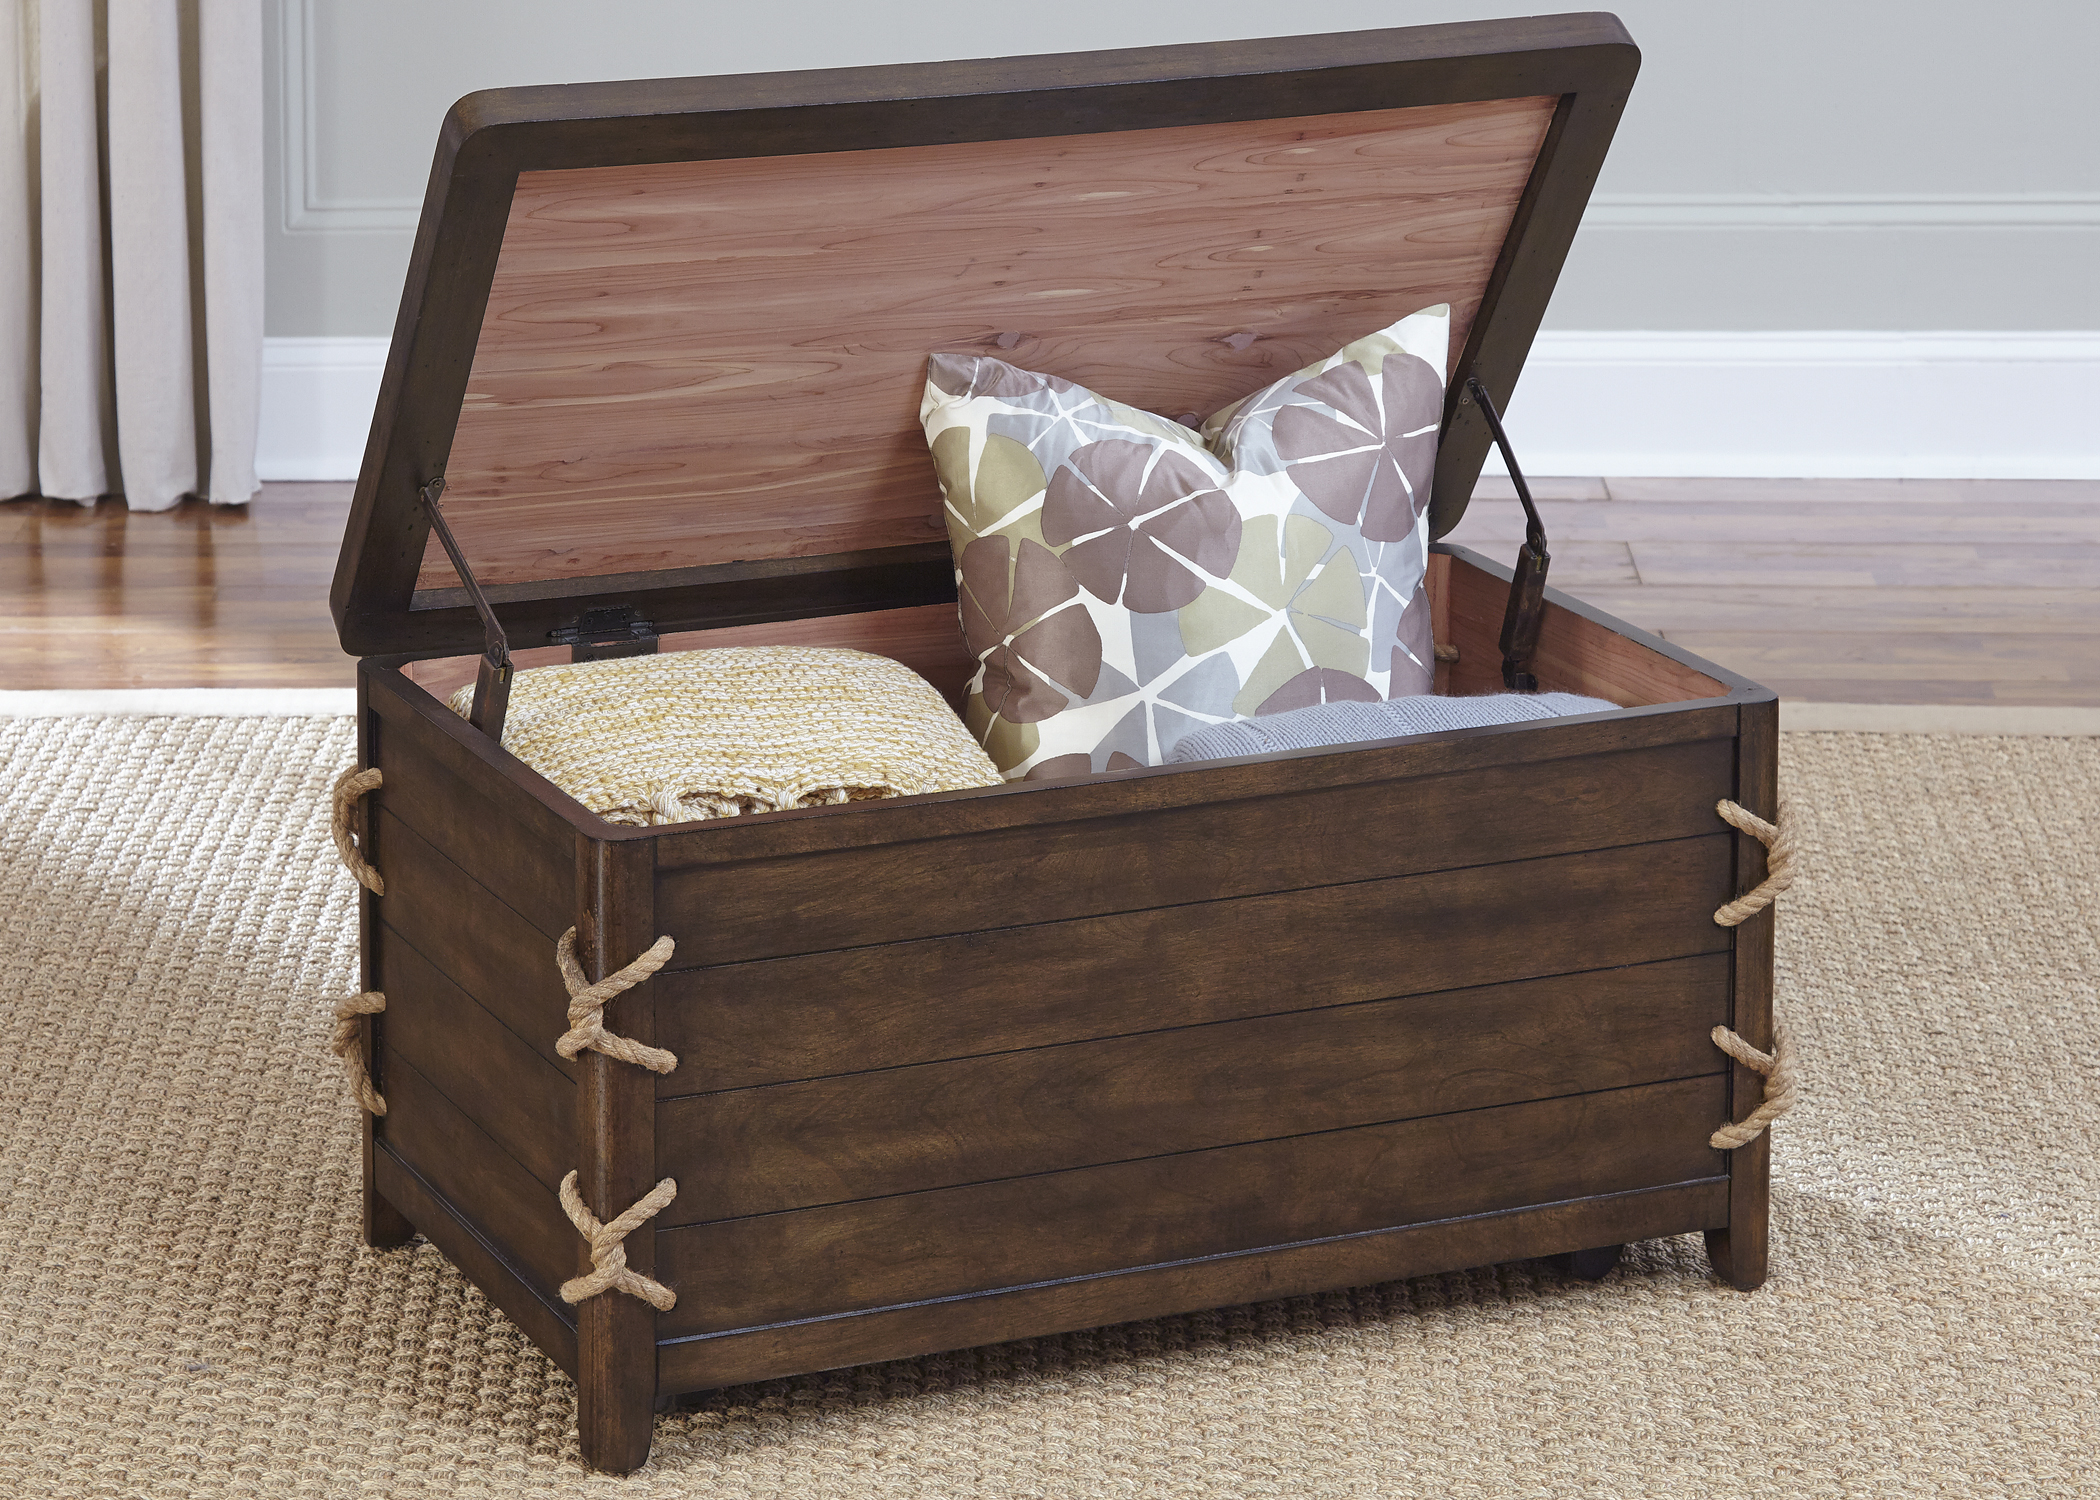 Liberty Furniture Dockside Storage Trunk - Item Number: 169-OT1012